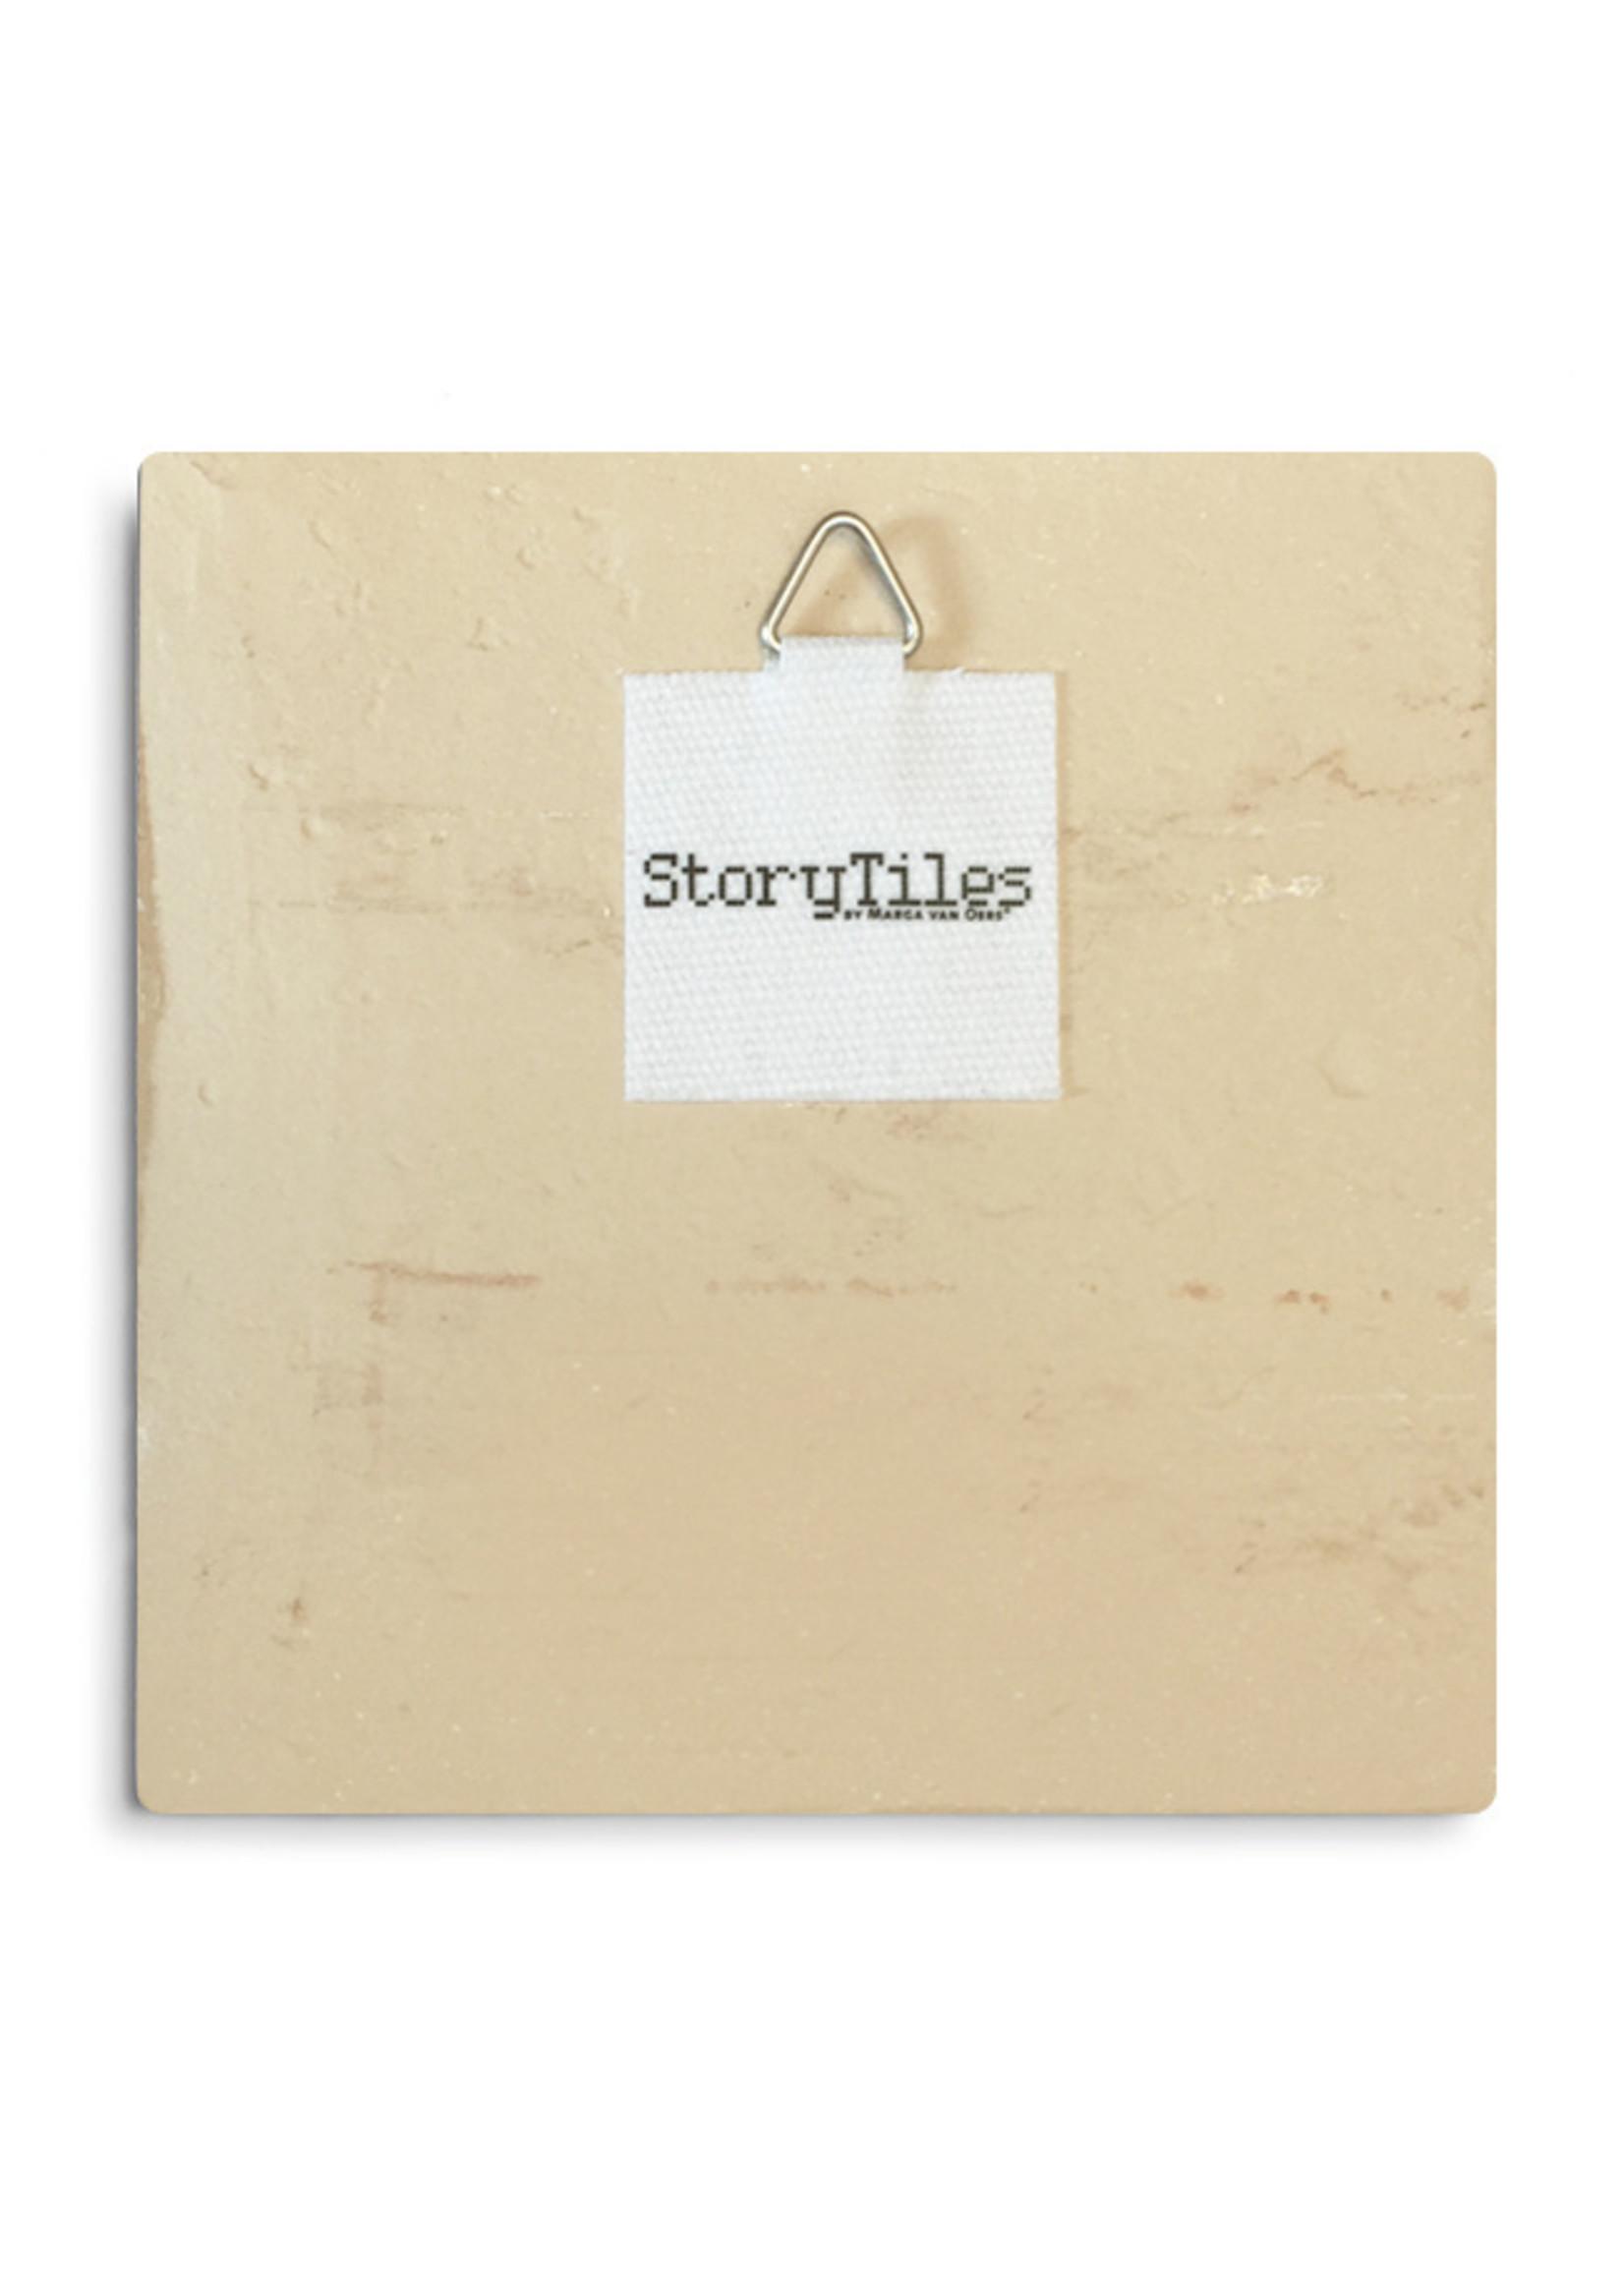 Storytiles Stadsleven 13x13cm